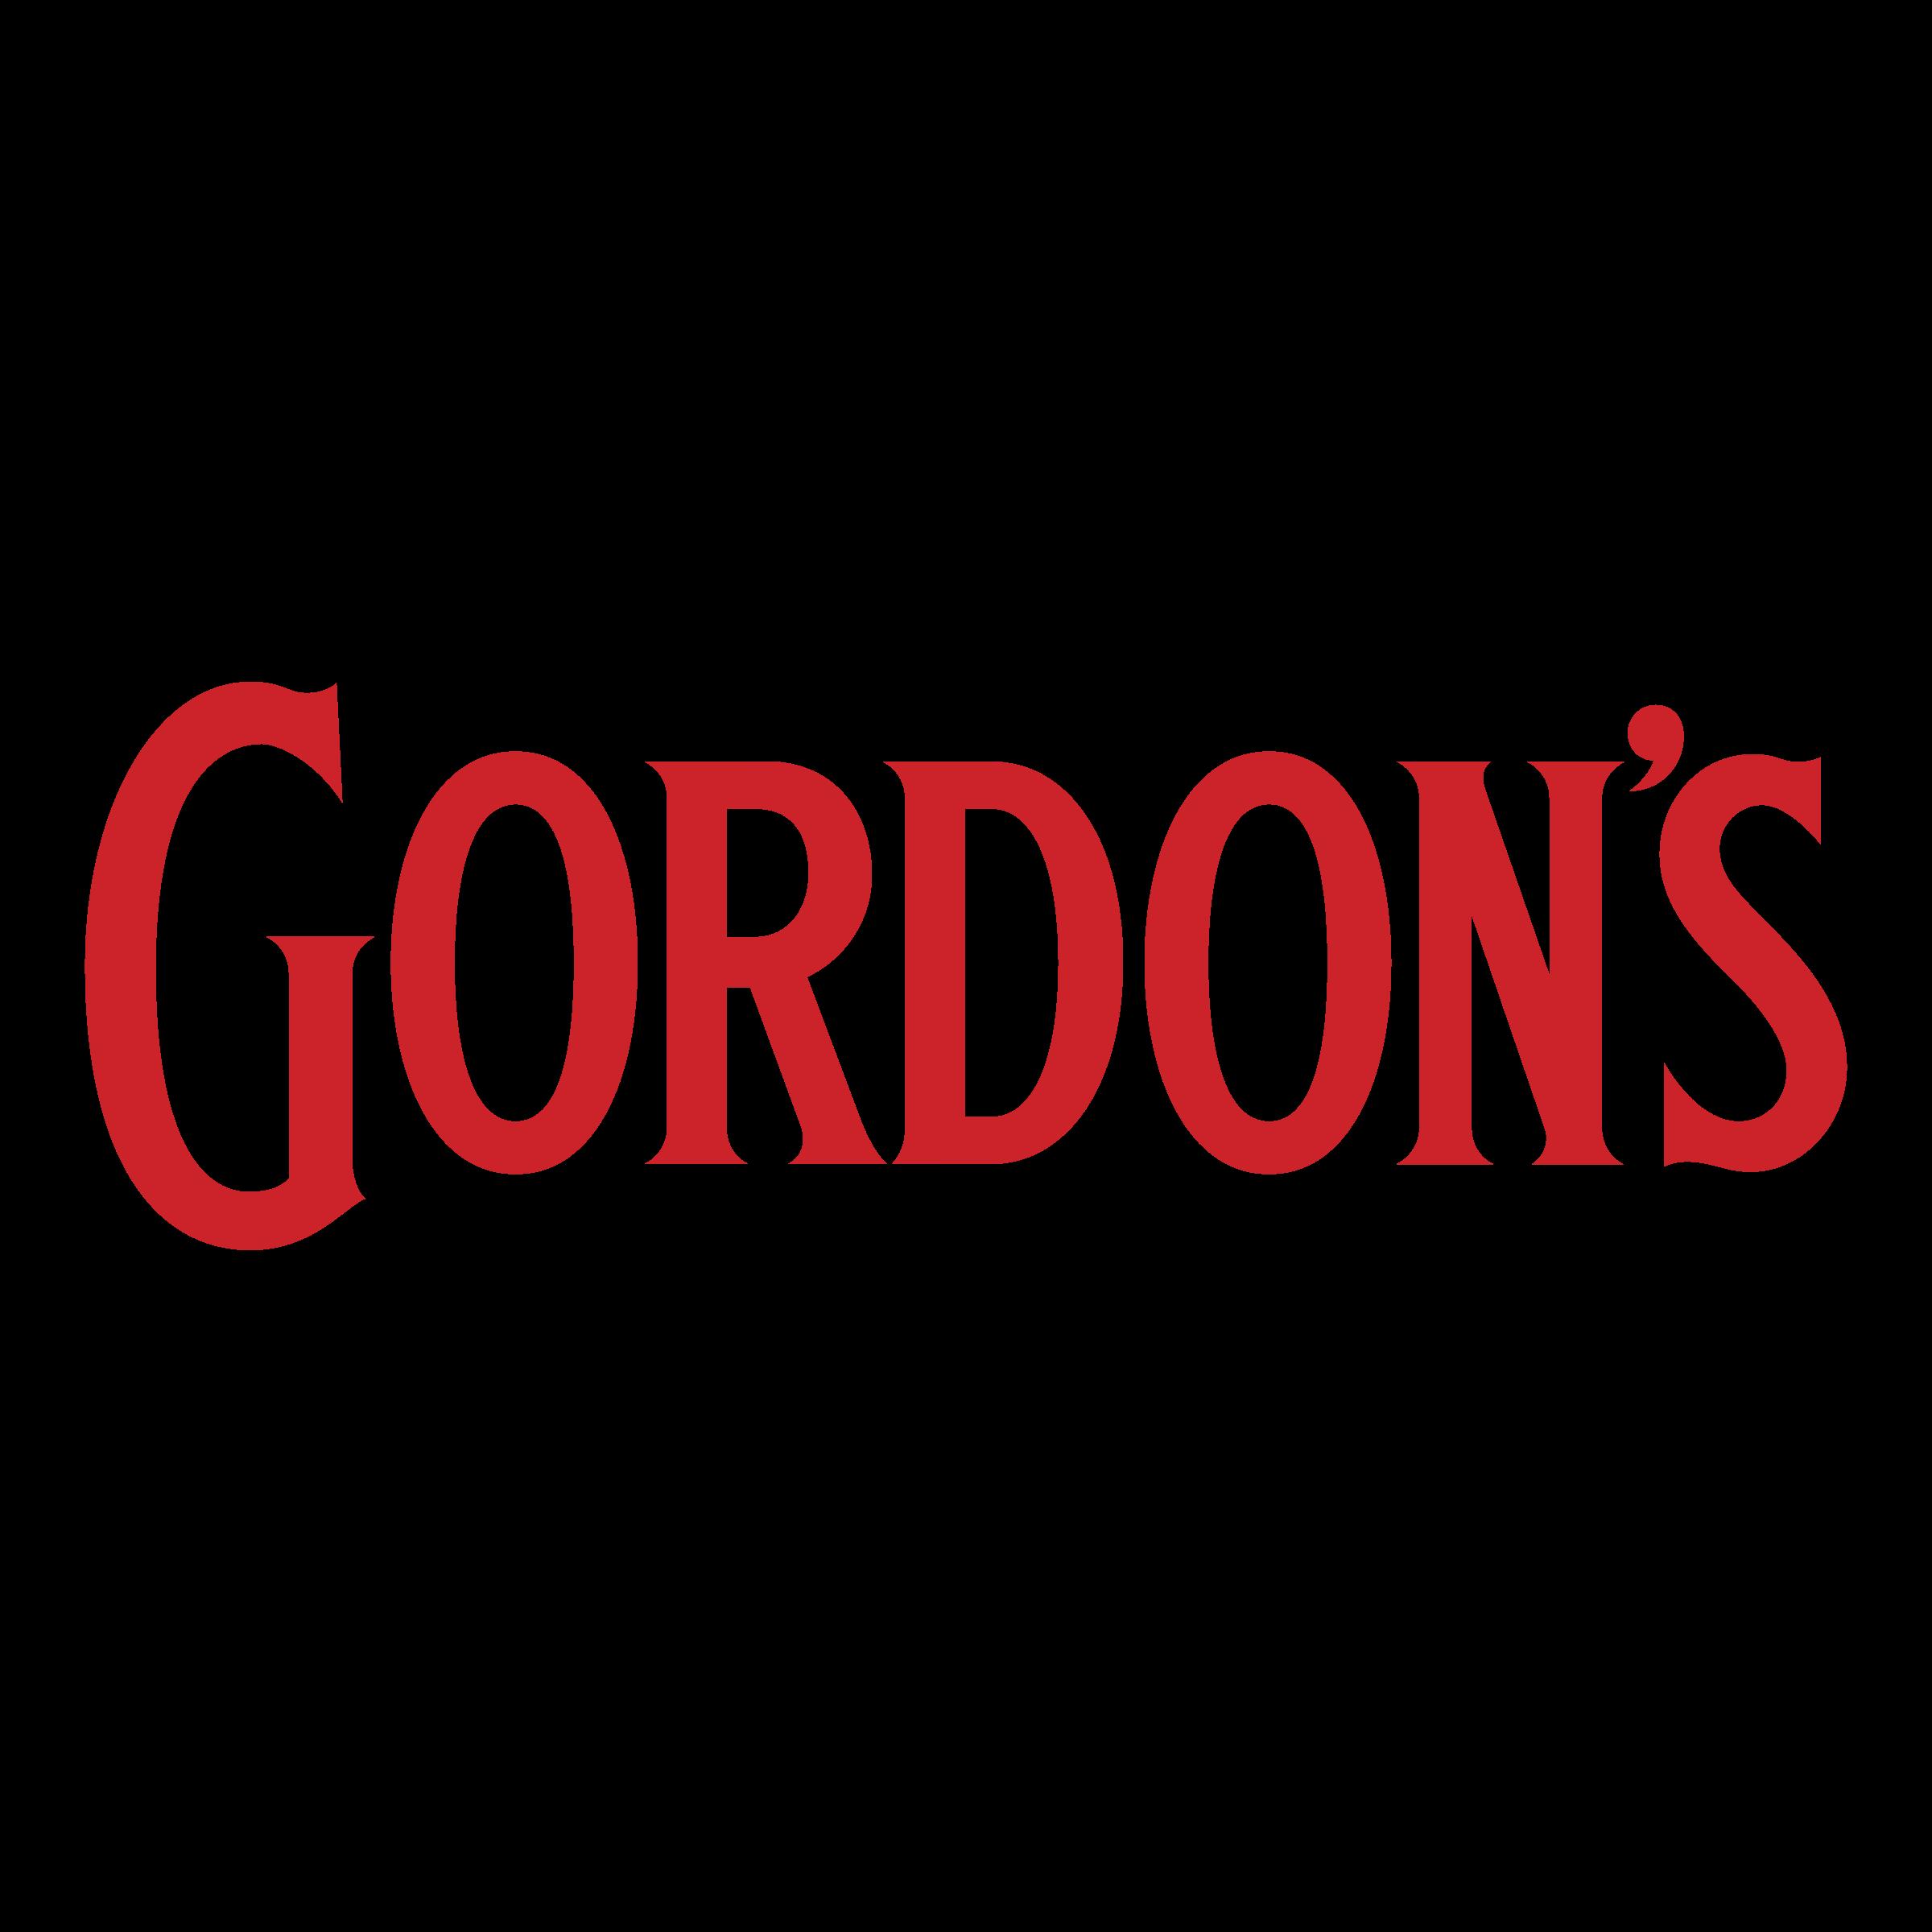 gordons-1-logo-png-transparent.png